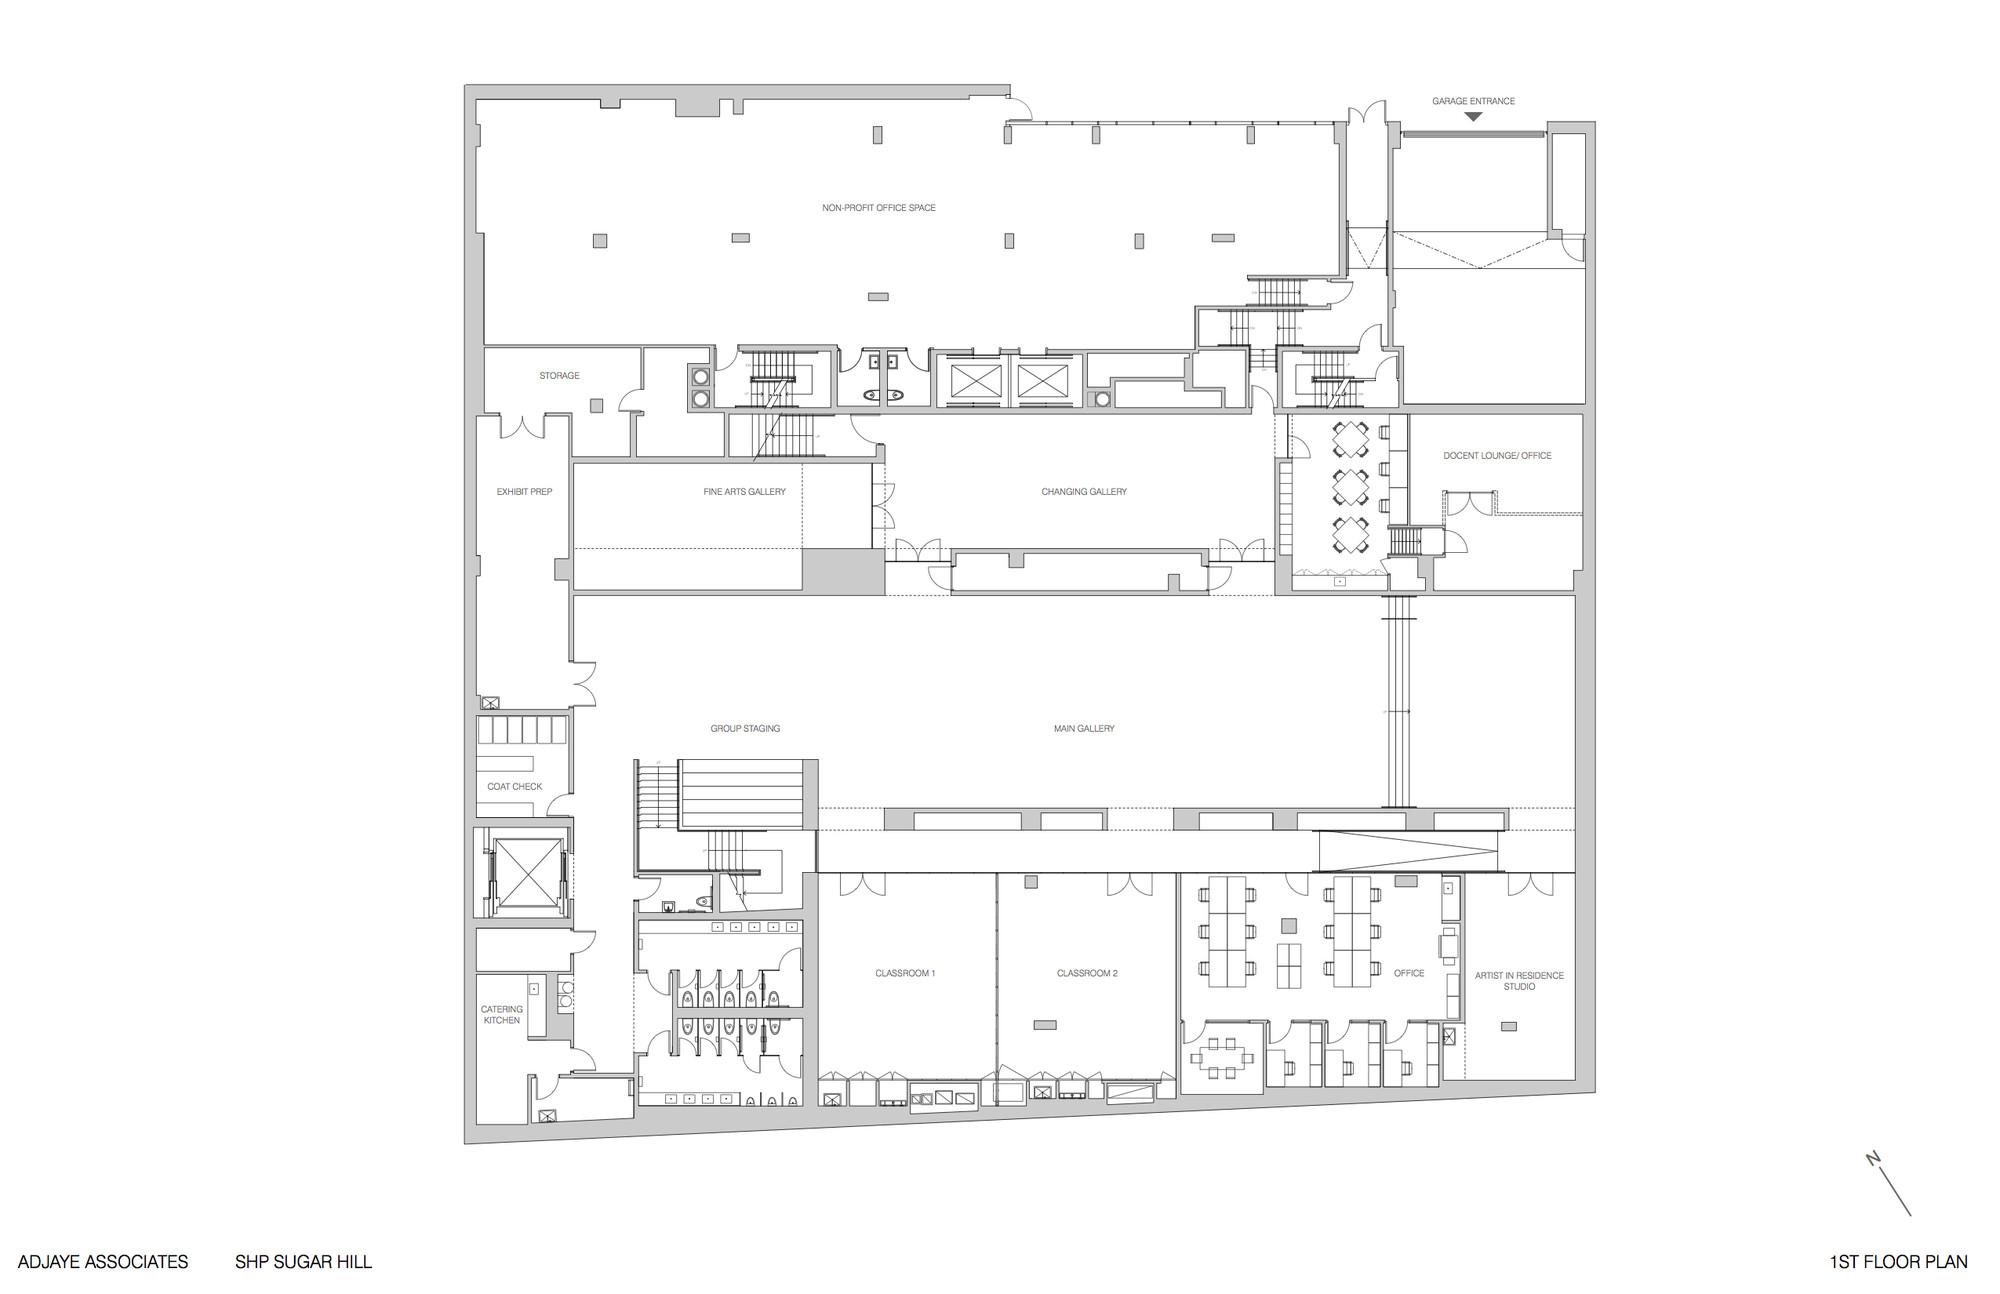 Gallery of david adjaye 39 s sugar hill development a new for Affordable housing floor plans